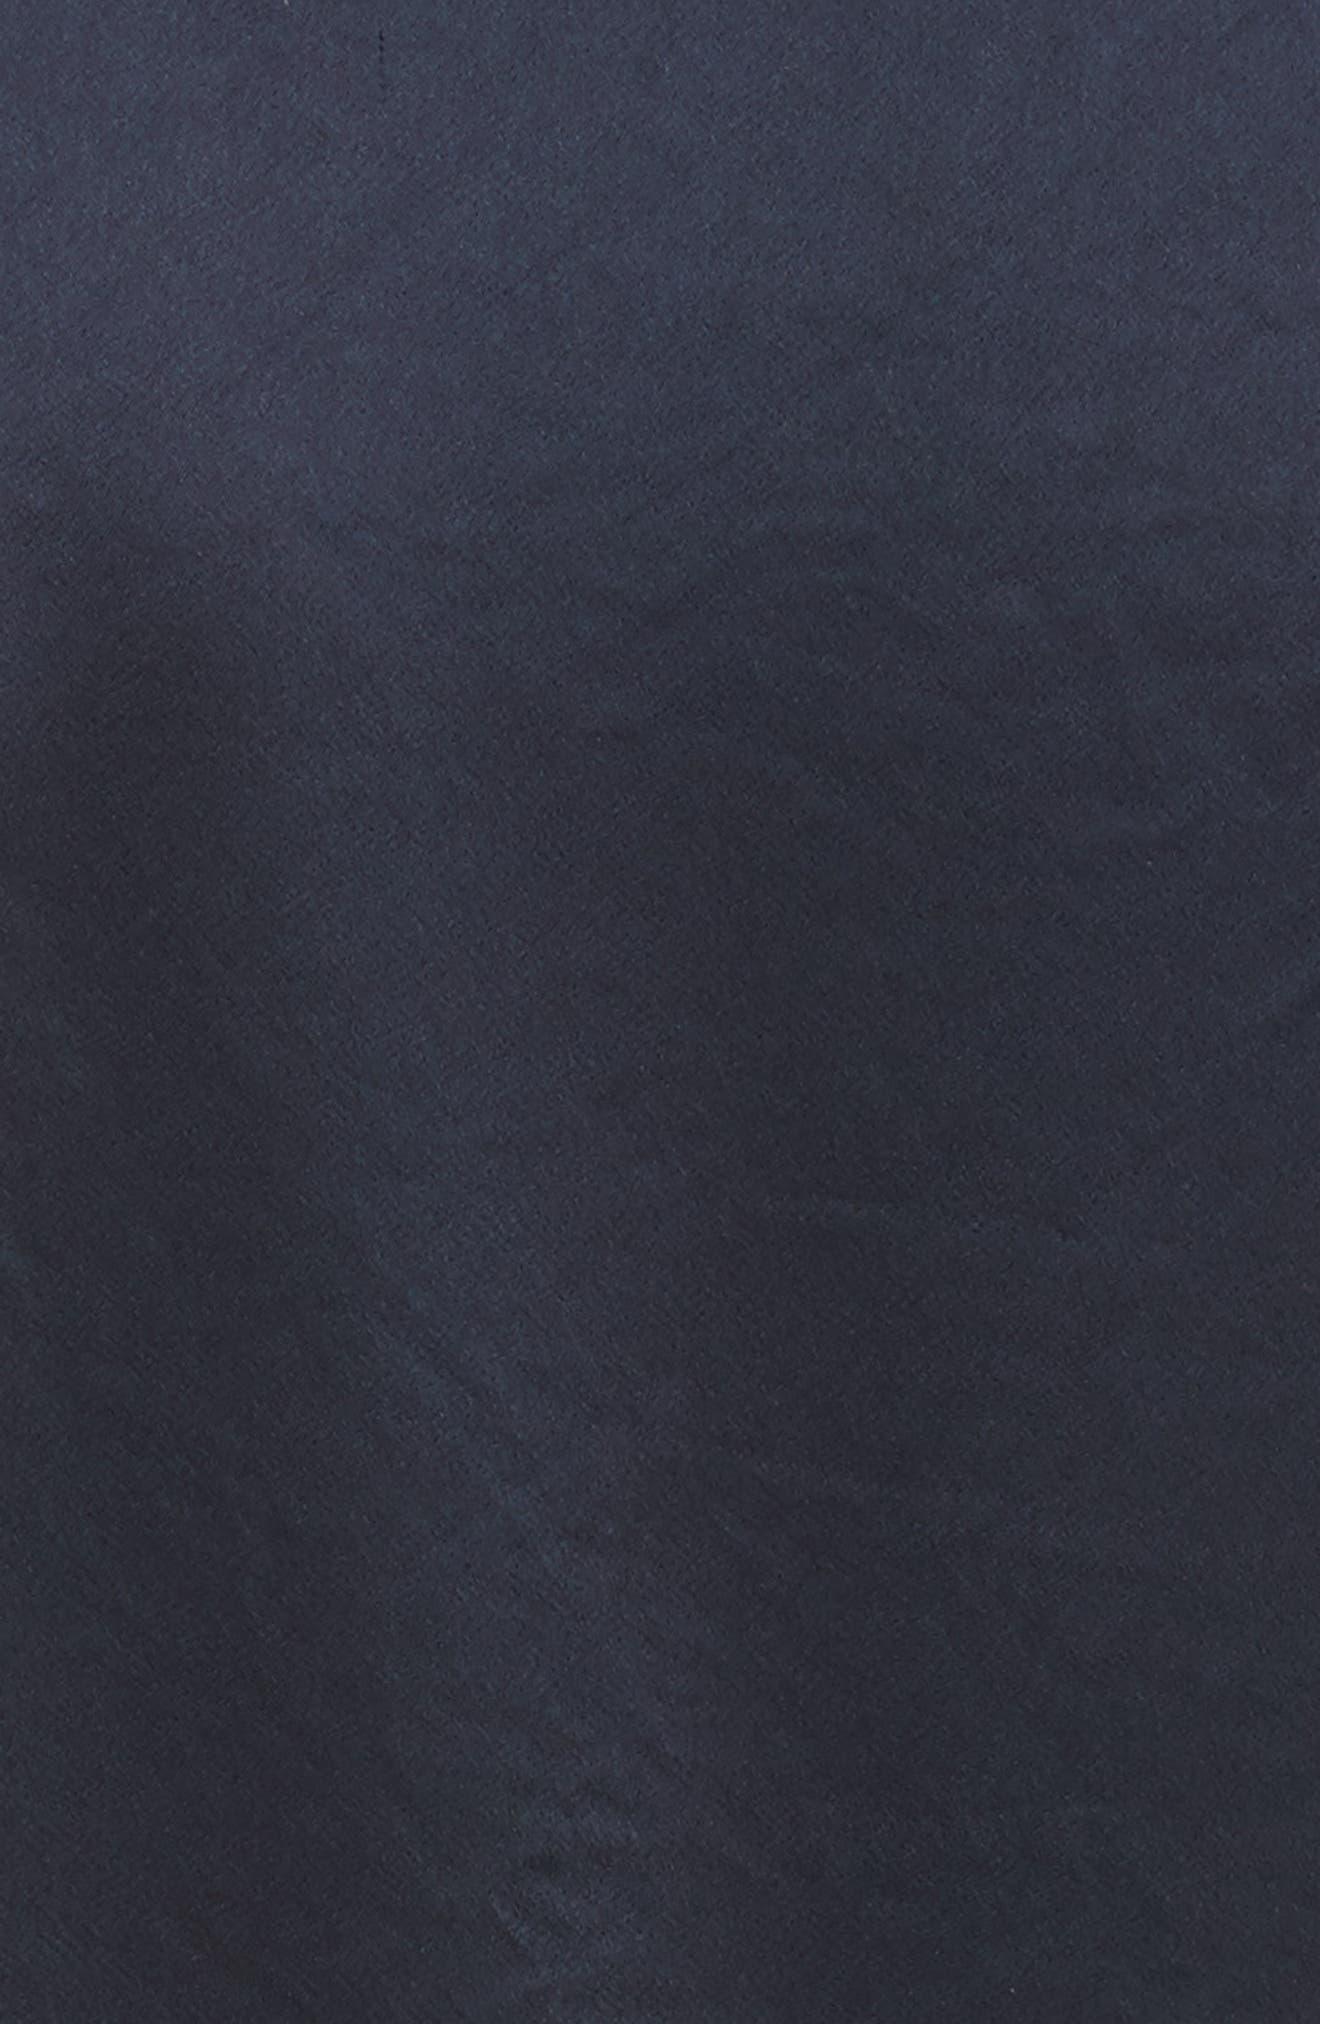 Midi Wrap Dress,                             Alternate thumbnail 5, color,                             Alexander Navy/ Black